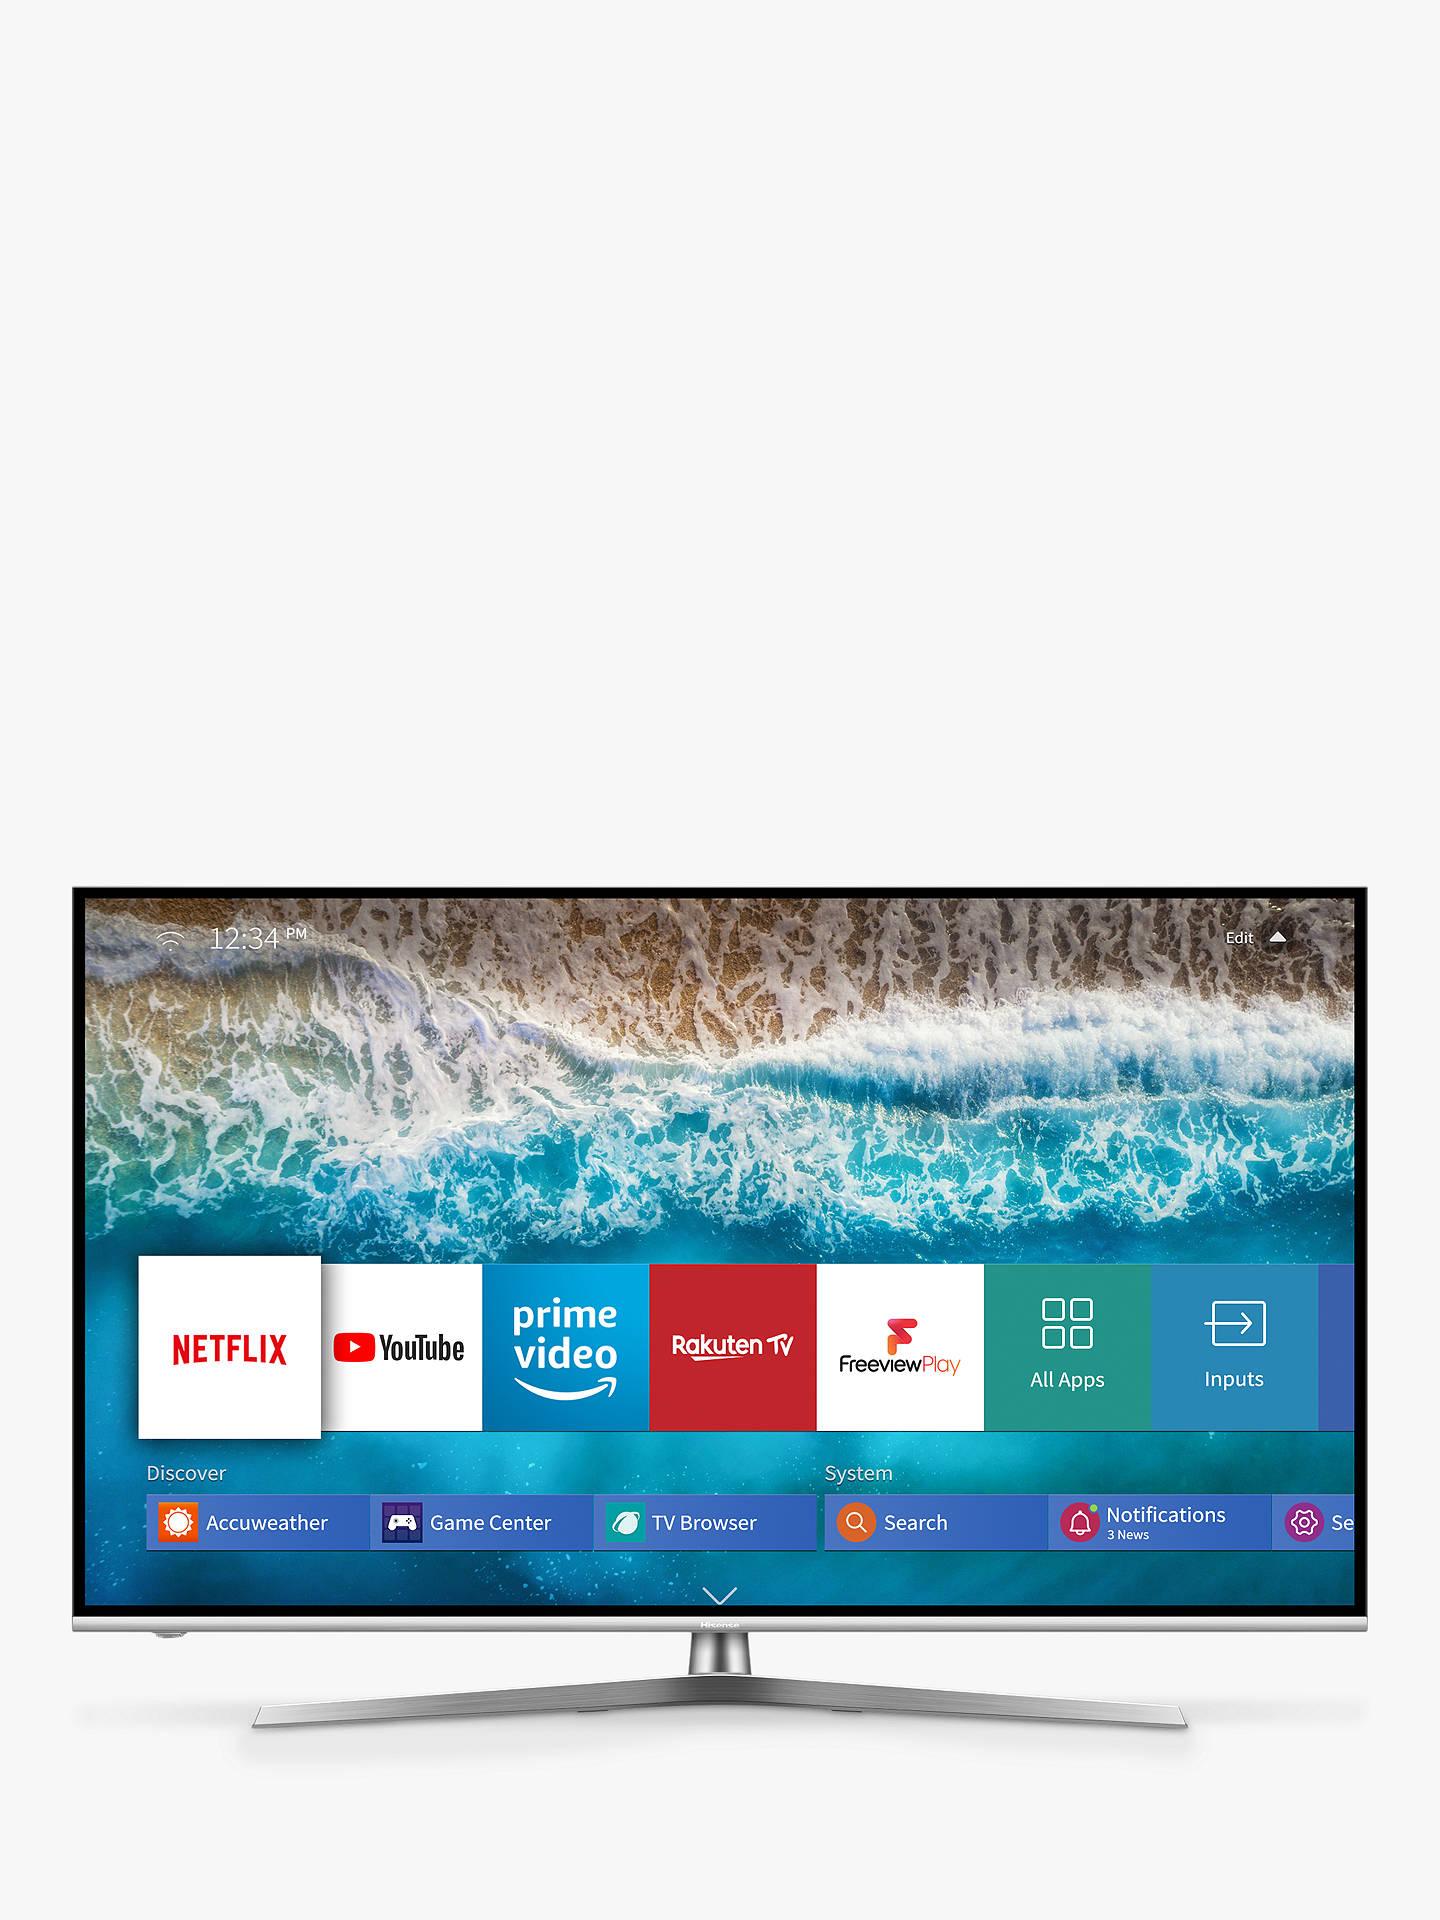 Hisense H55U8BUK (2019) ULED HDR 4K Ultra HD Smart TV, 55